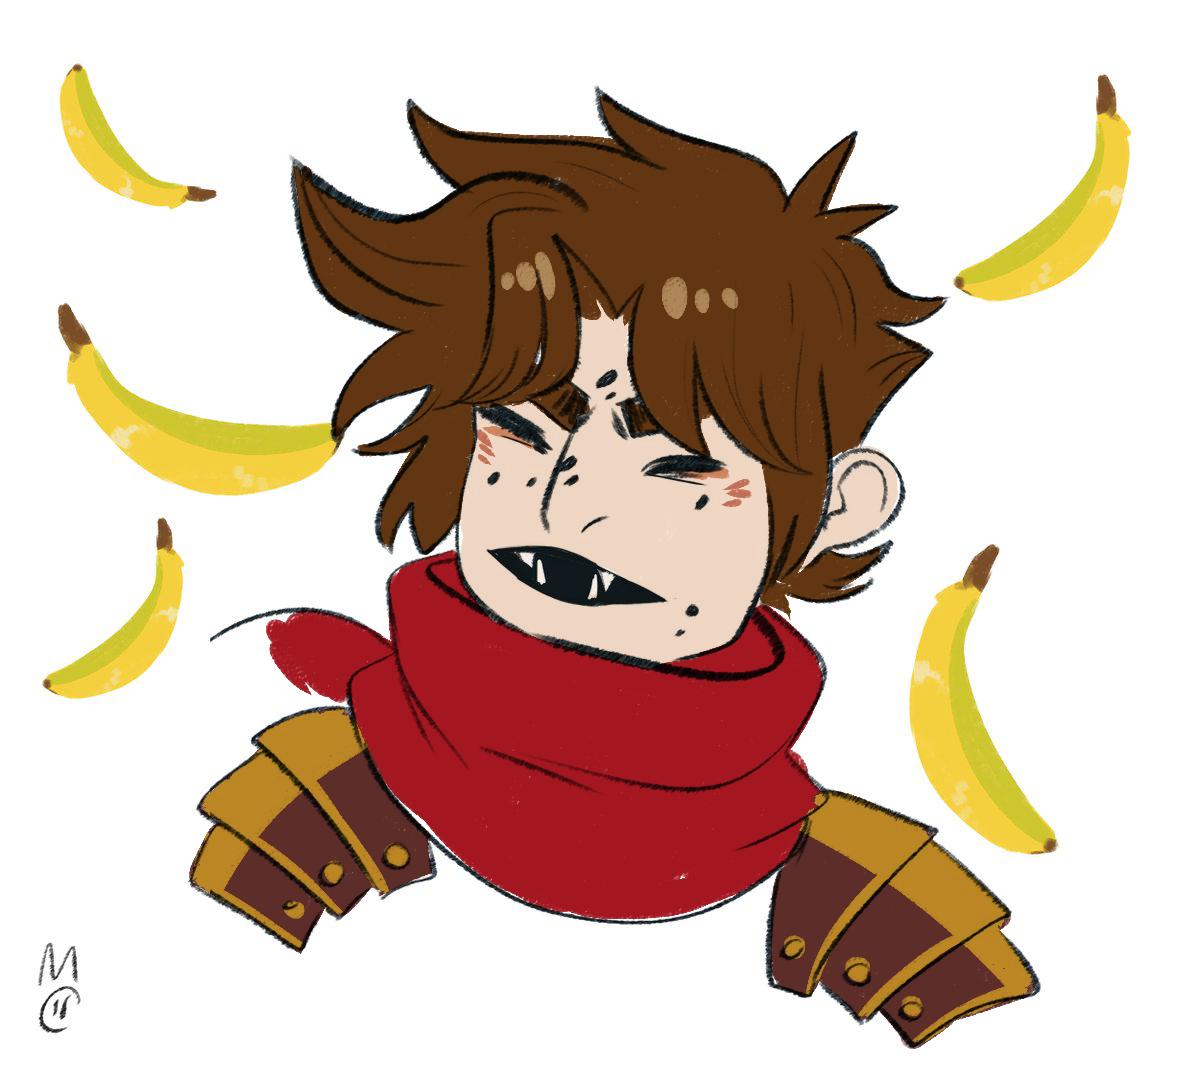 nikita no bananavcolor